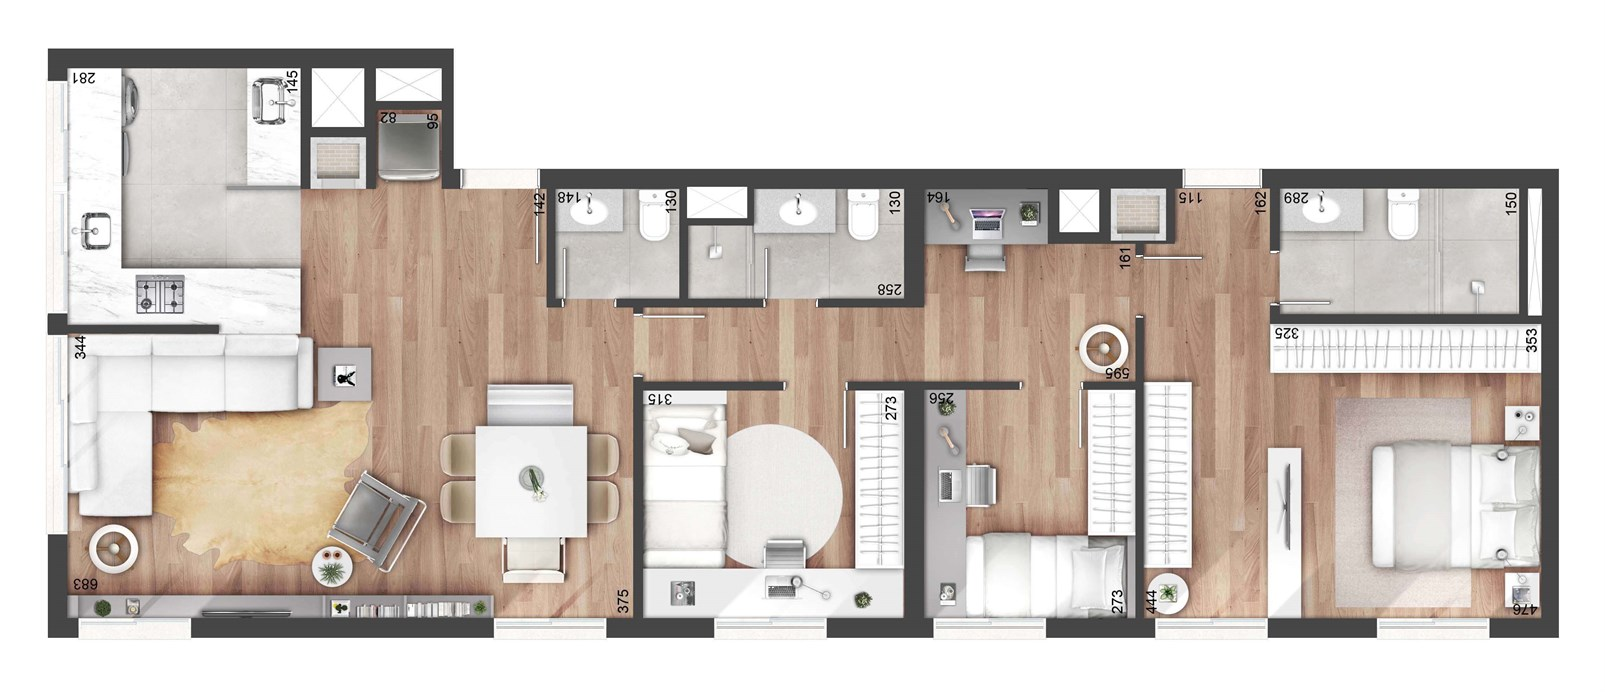 3 dormitorios 108m²   NY, 205 – Apartamentono  Auxiliadora - Porto Alegre - Rio Grande do Sul